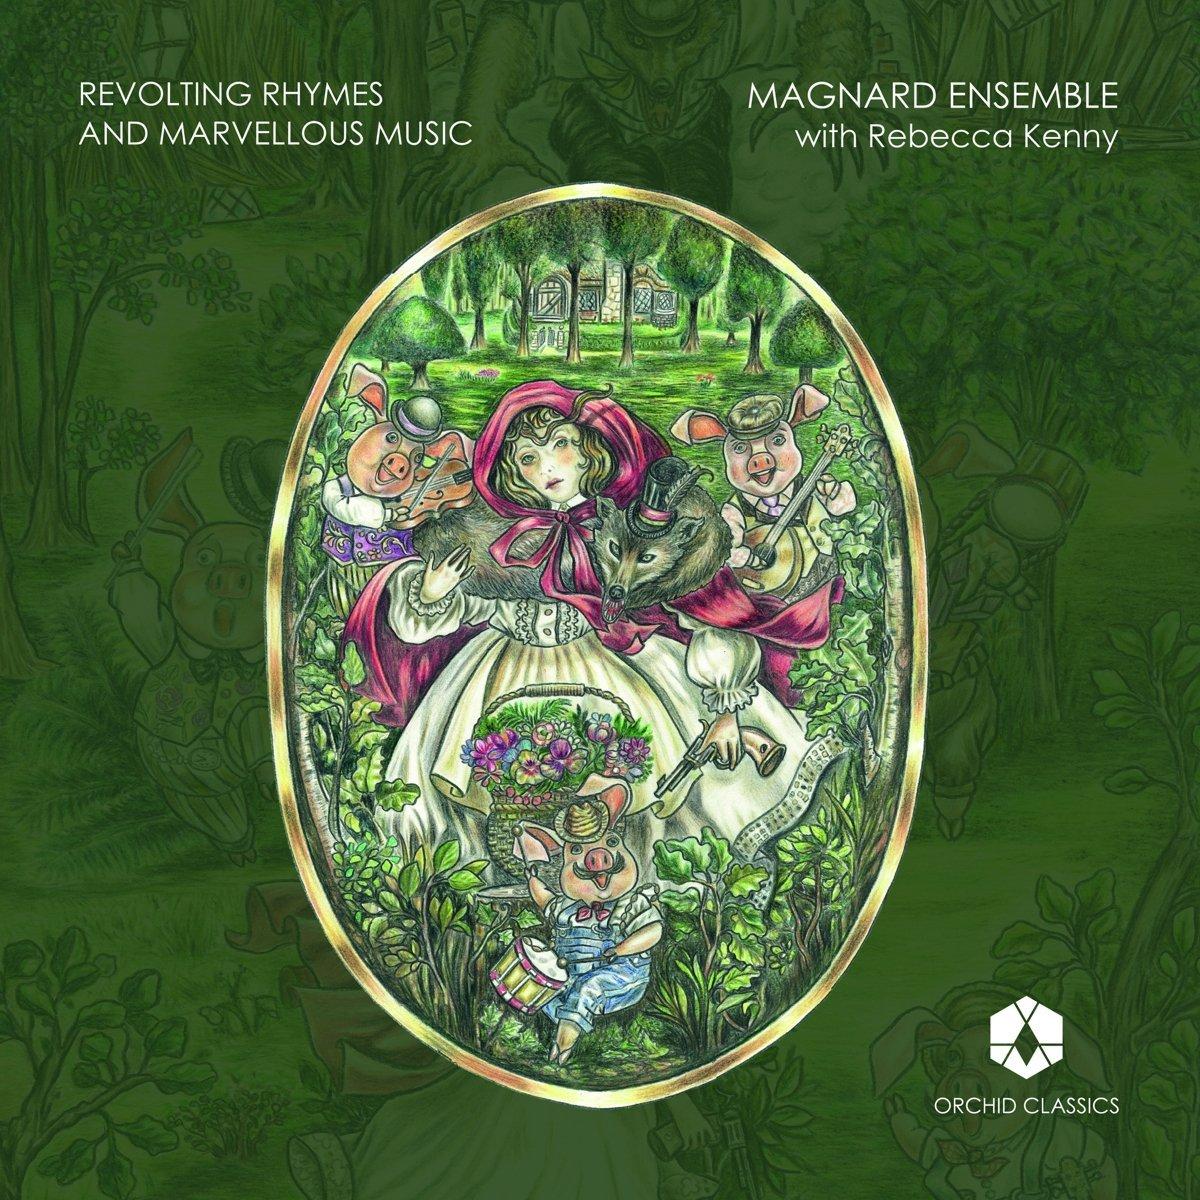 Paul Patterson: Revolting Rhymes - Magnard Ensembl